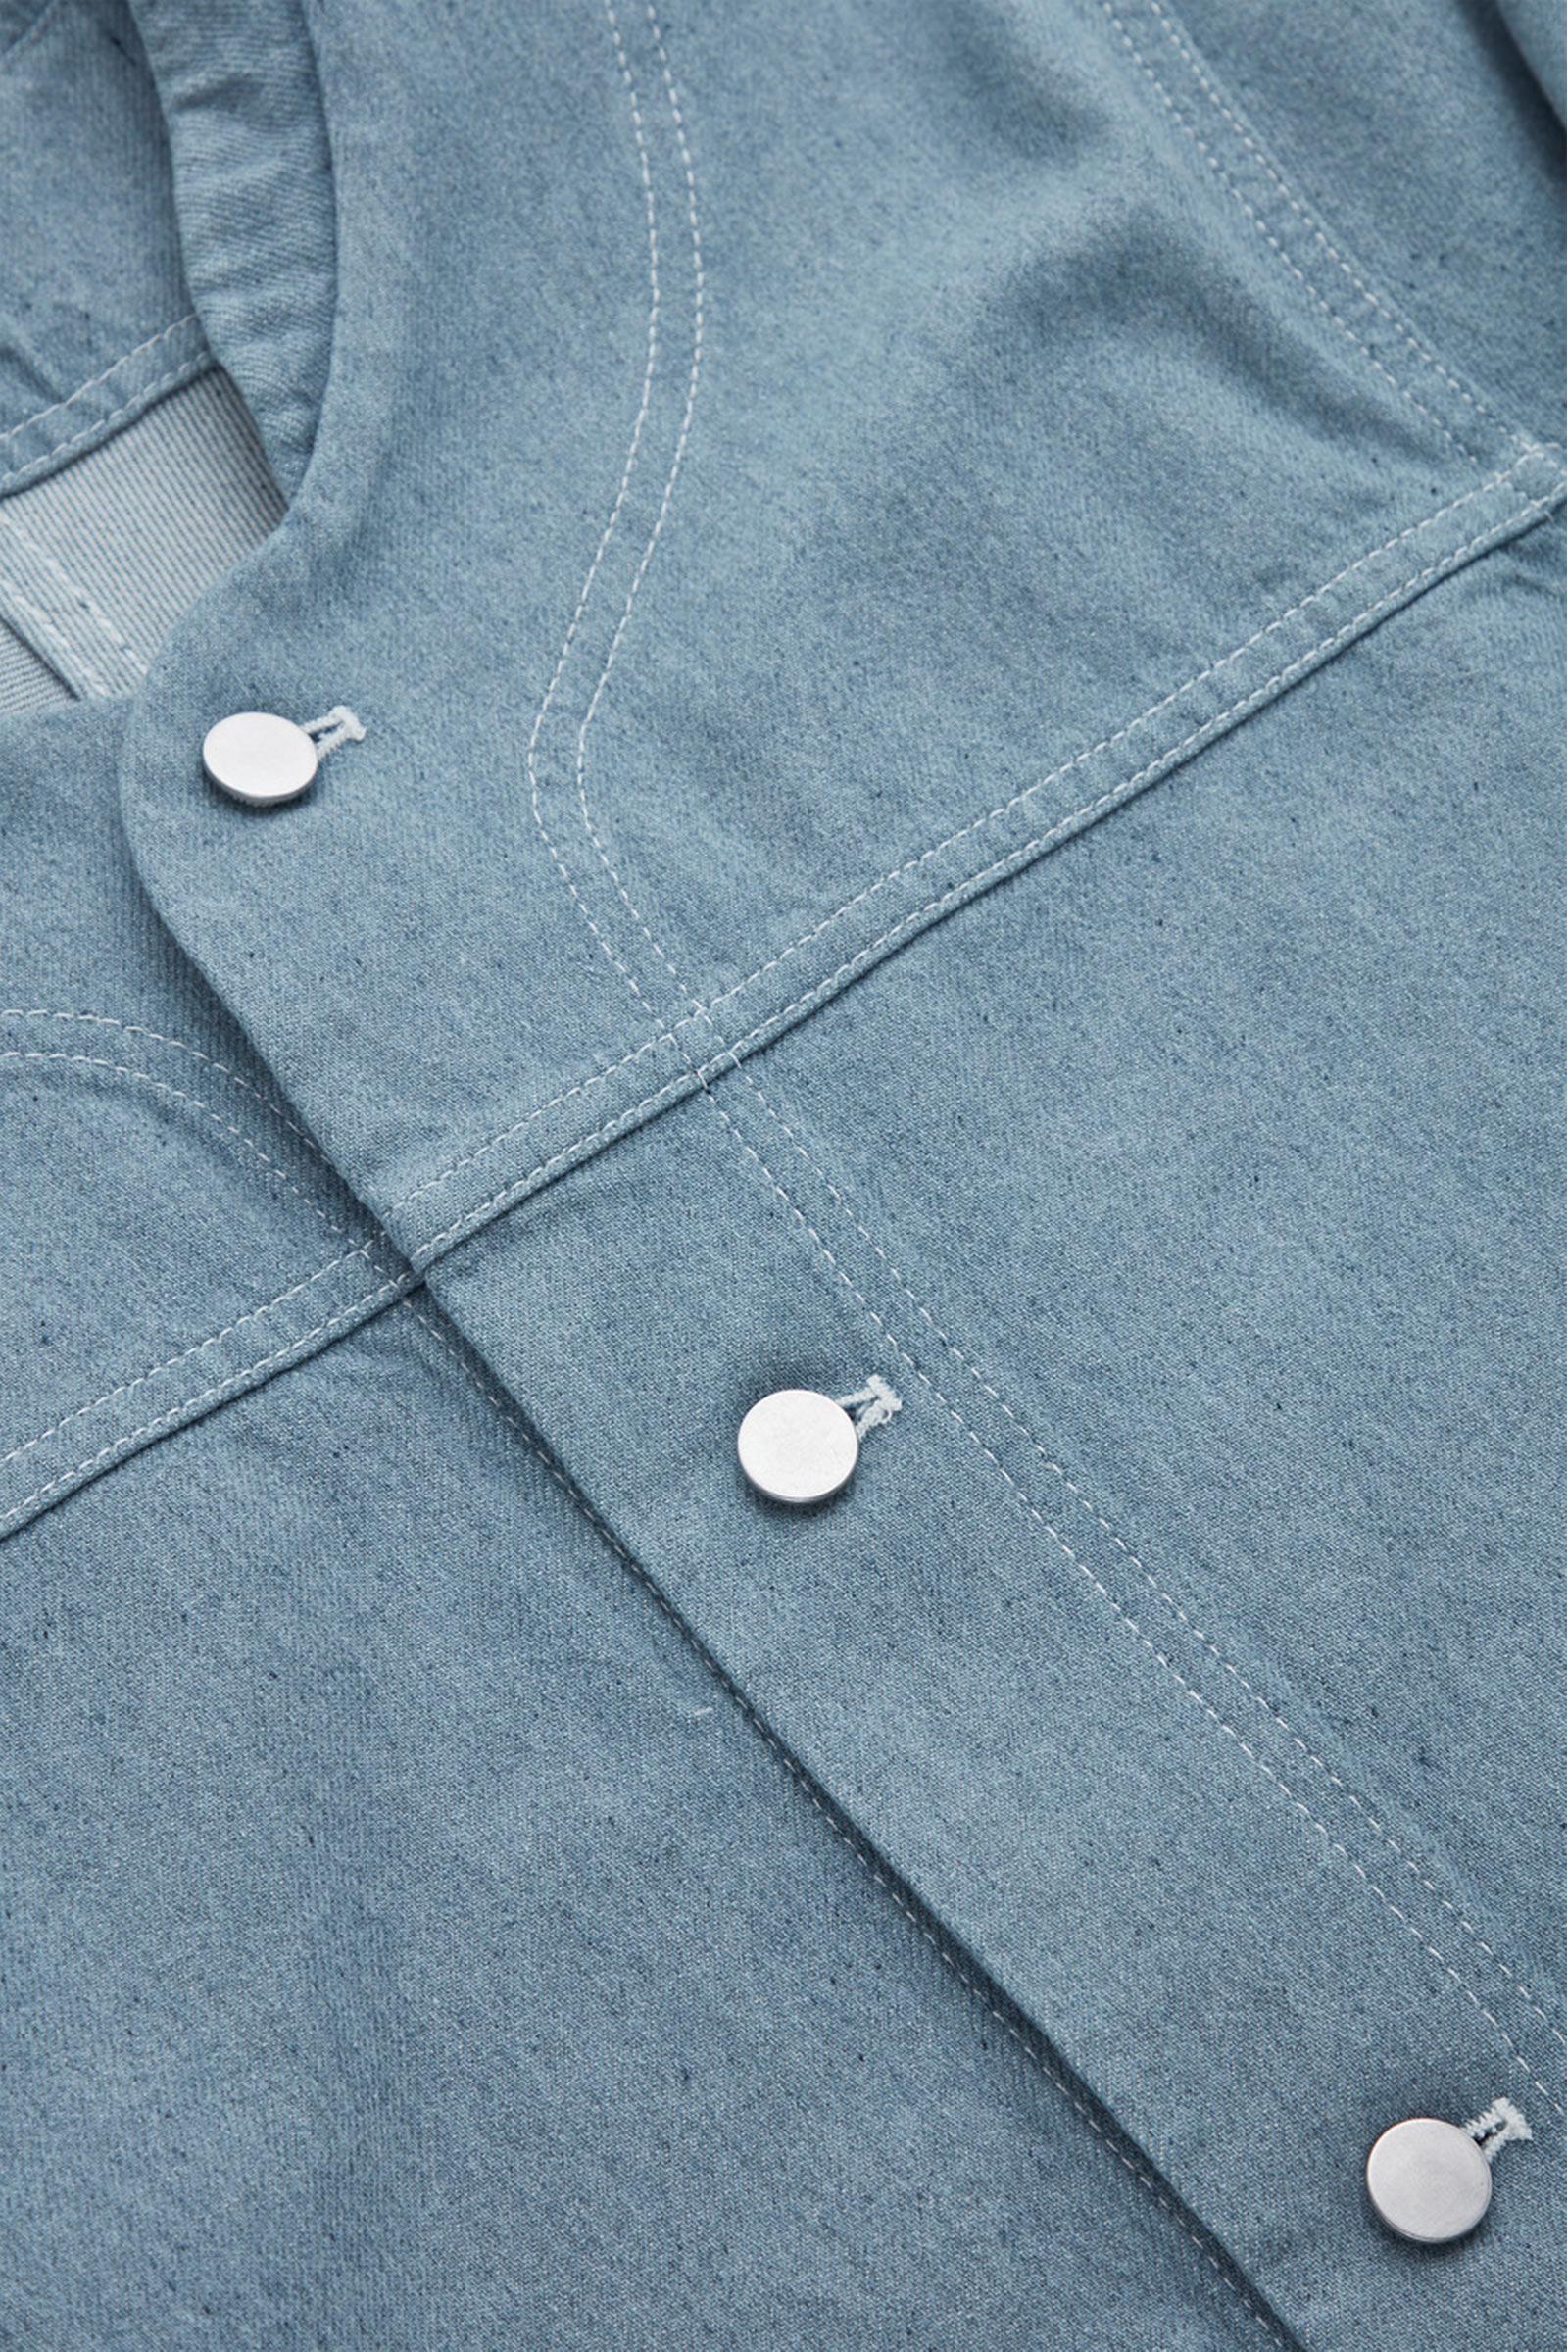 COS 칼라리스 데님 베이스볼 재킷의 라이트 블루컬러 Detail입니다.